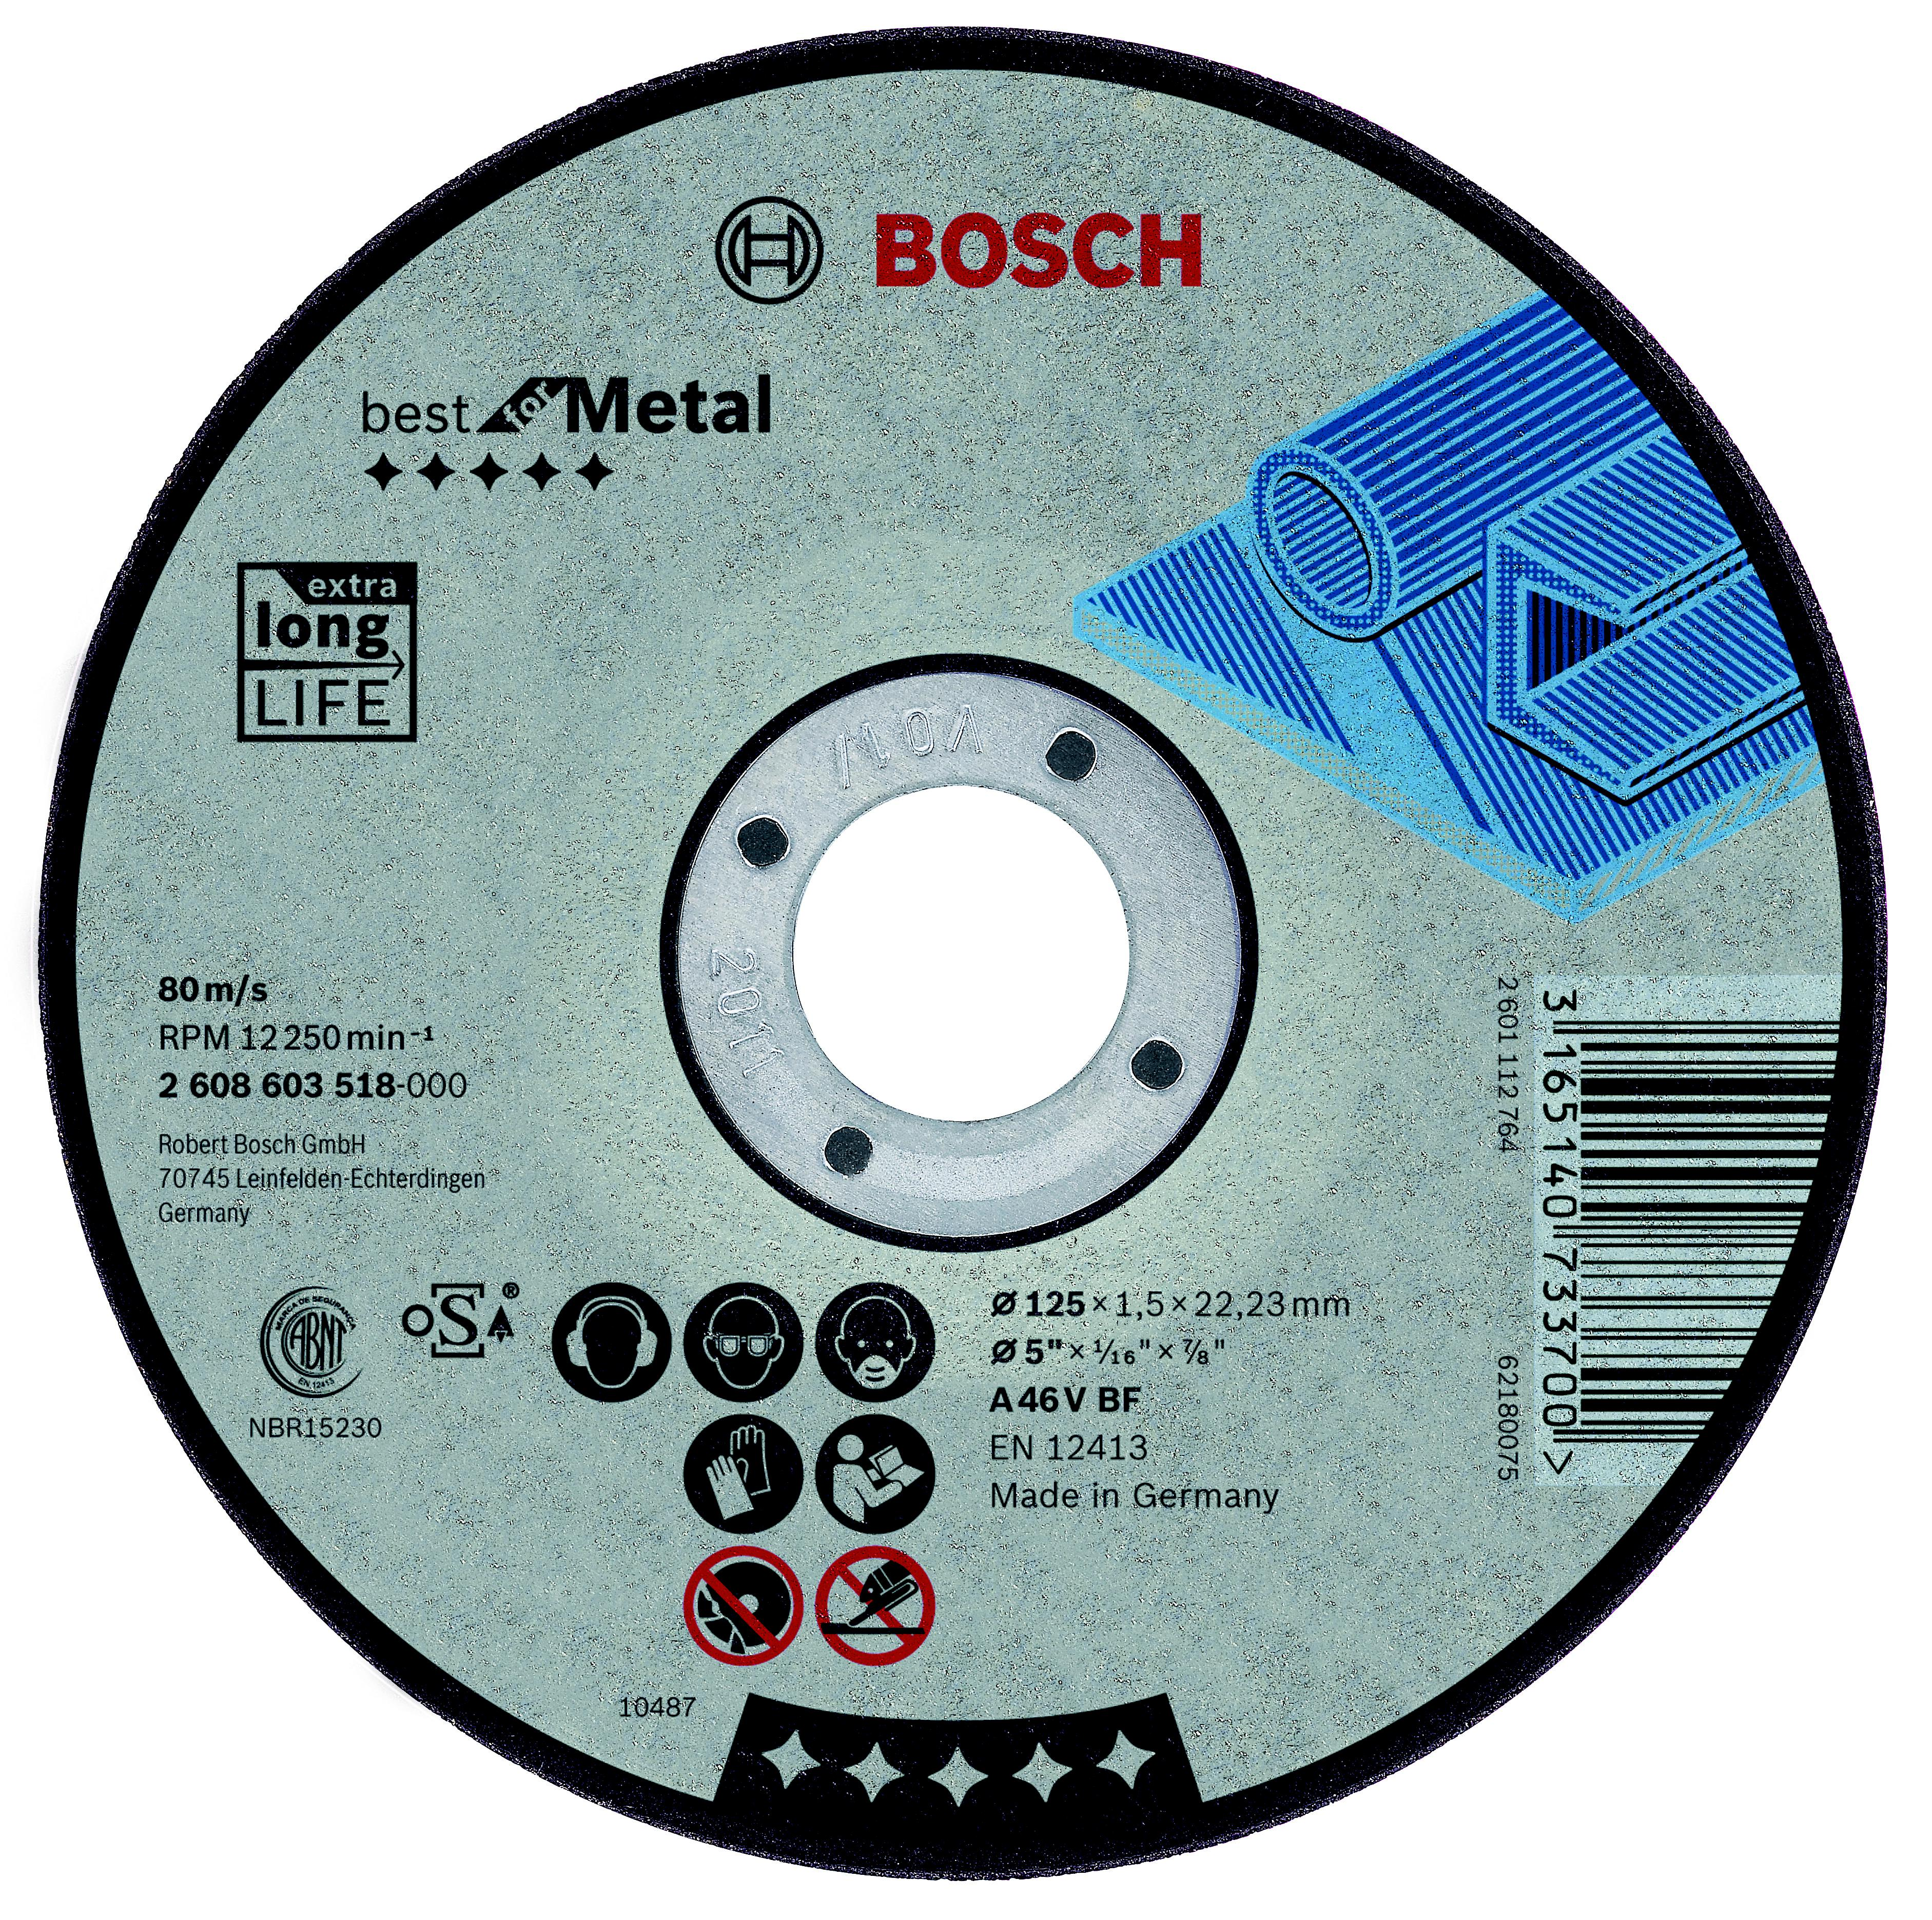 Круг отрезной Bosch 180х2.5х22 best for metal (2.608.603.528) круг отрезной bosch 115х1 5х22 best for metal 2 608 603 517